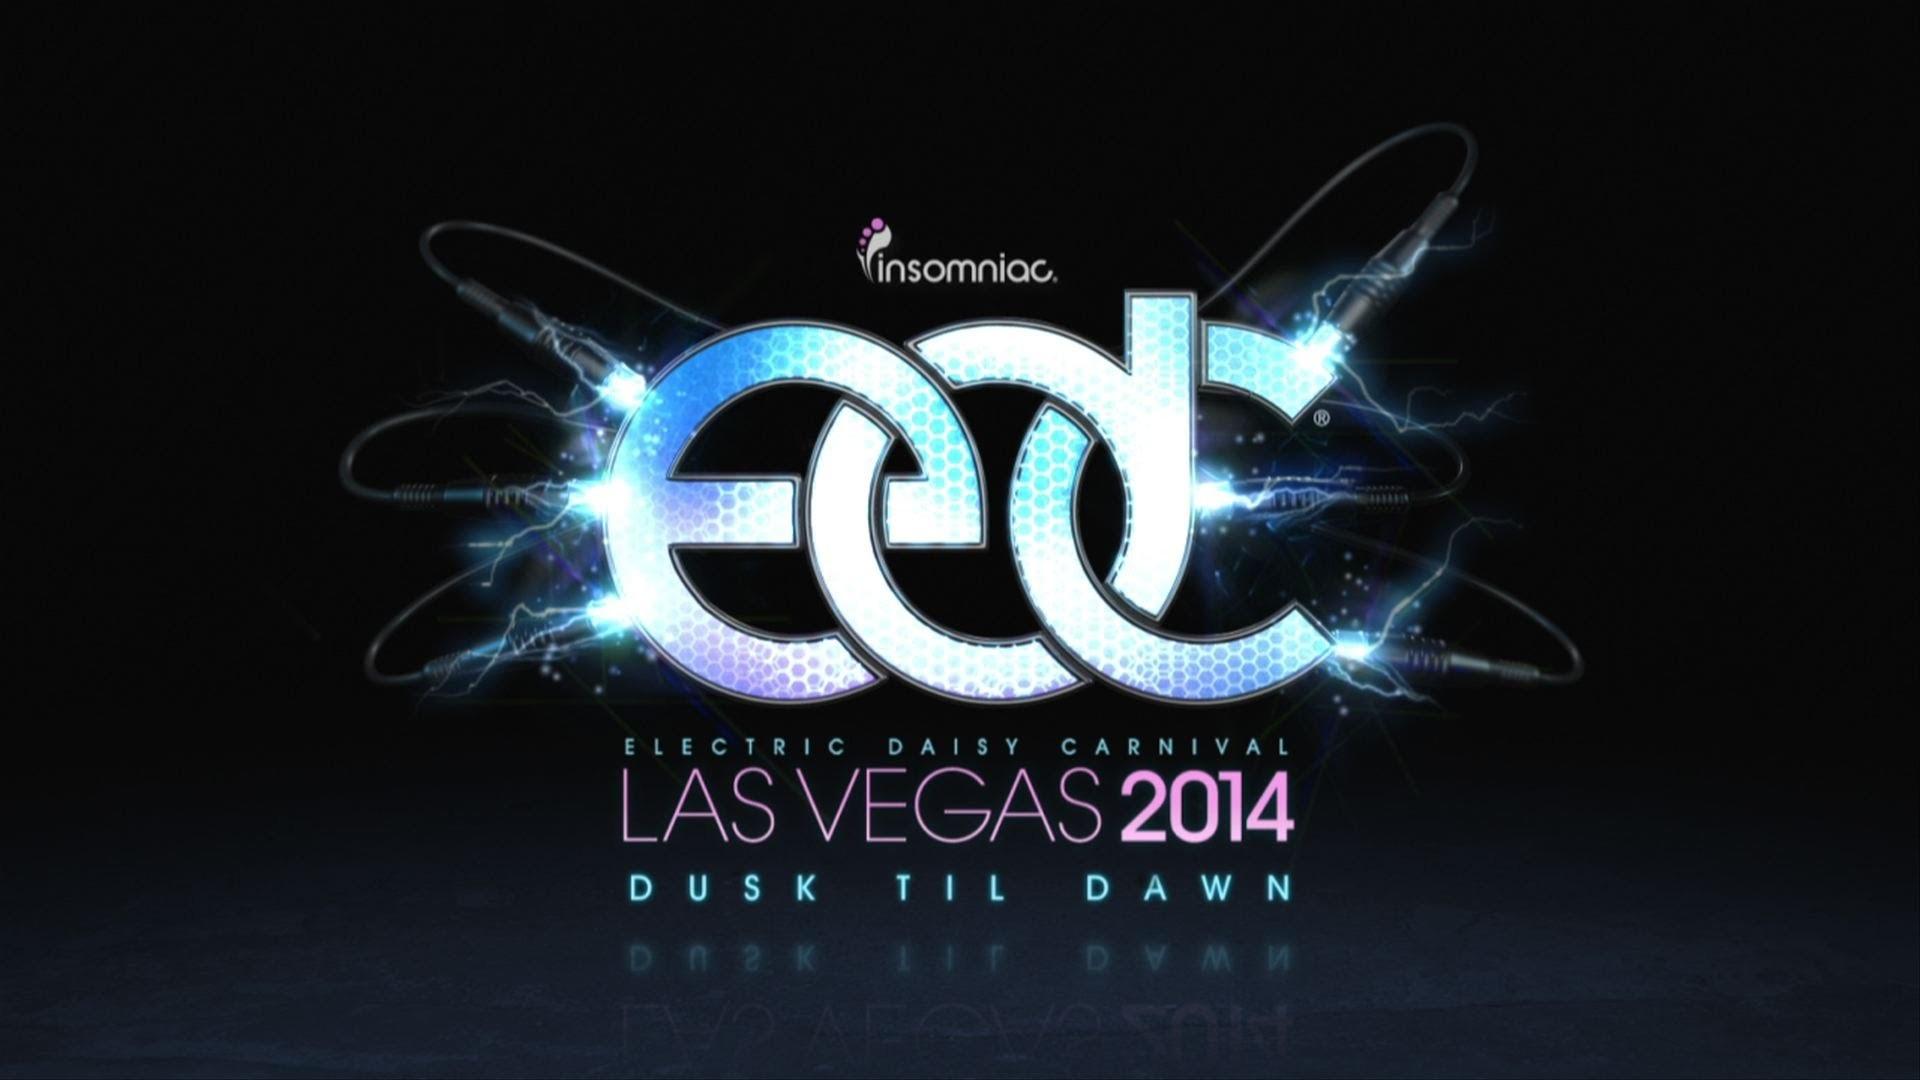 10 Songs We Fell in Love with at EDC Las Vegas 2014